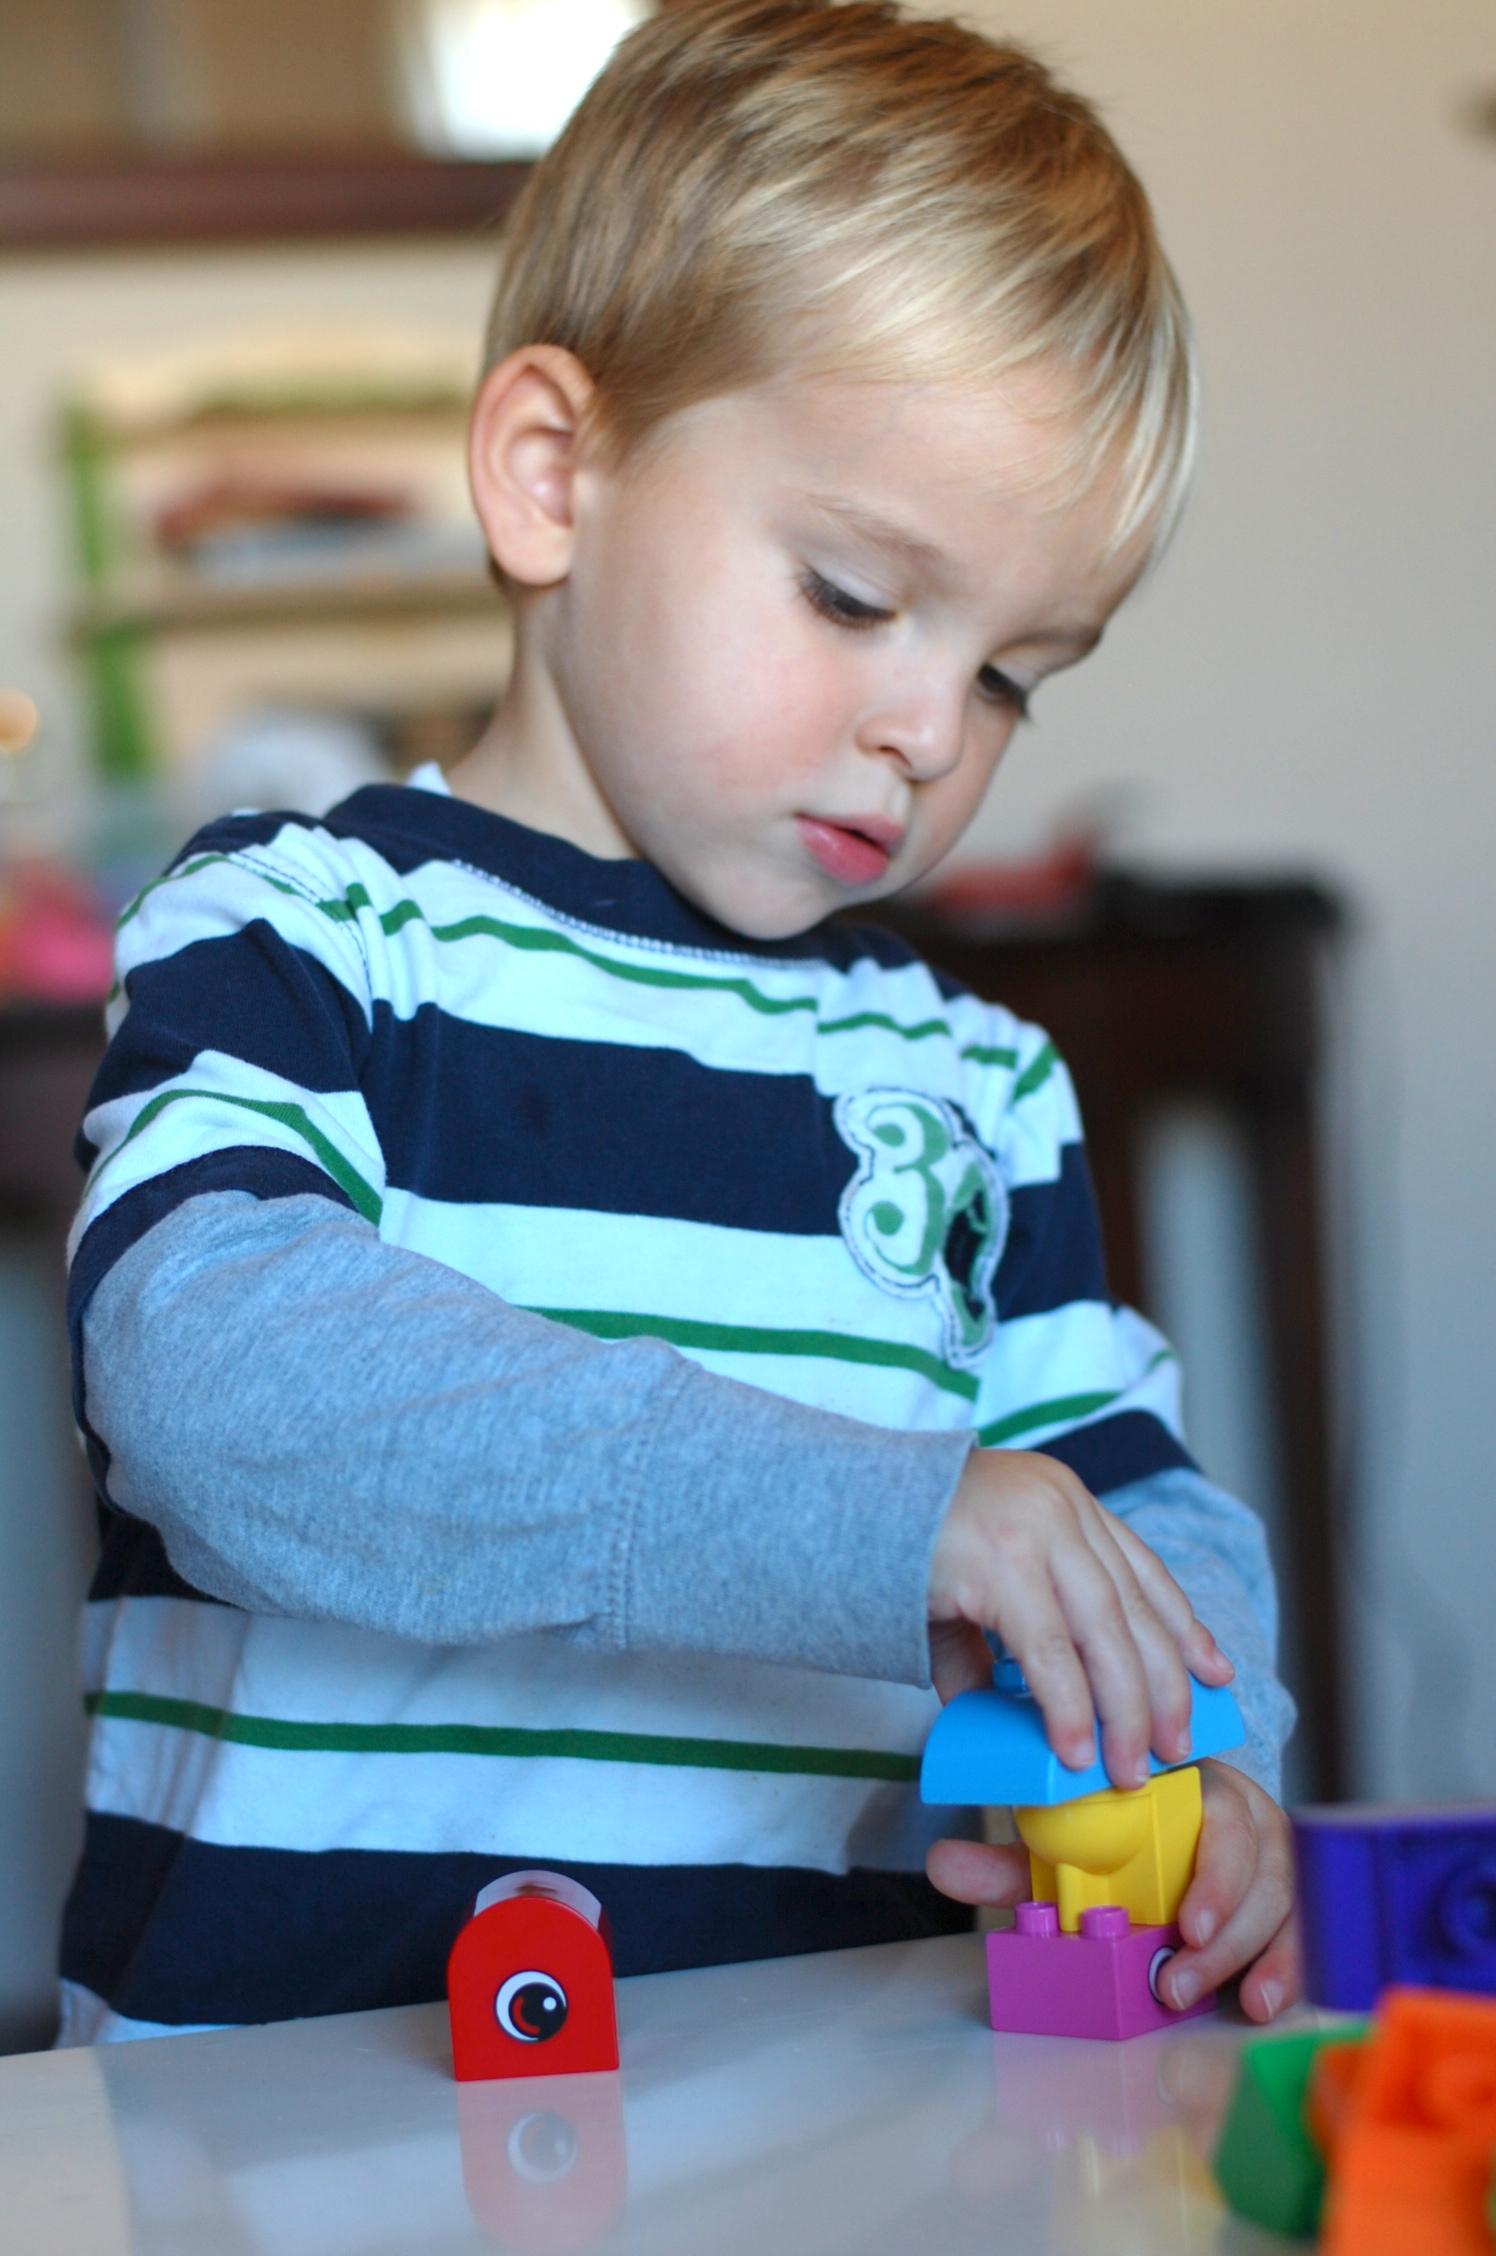 learning through play with lego duplo | #legoduploplay